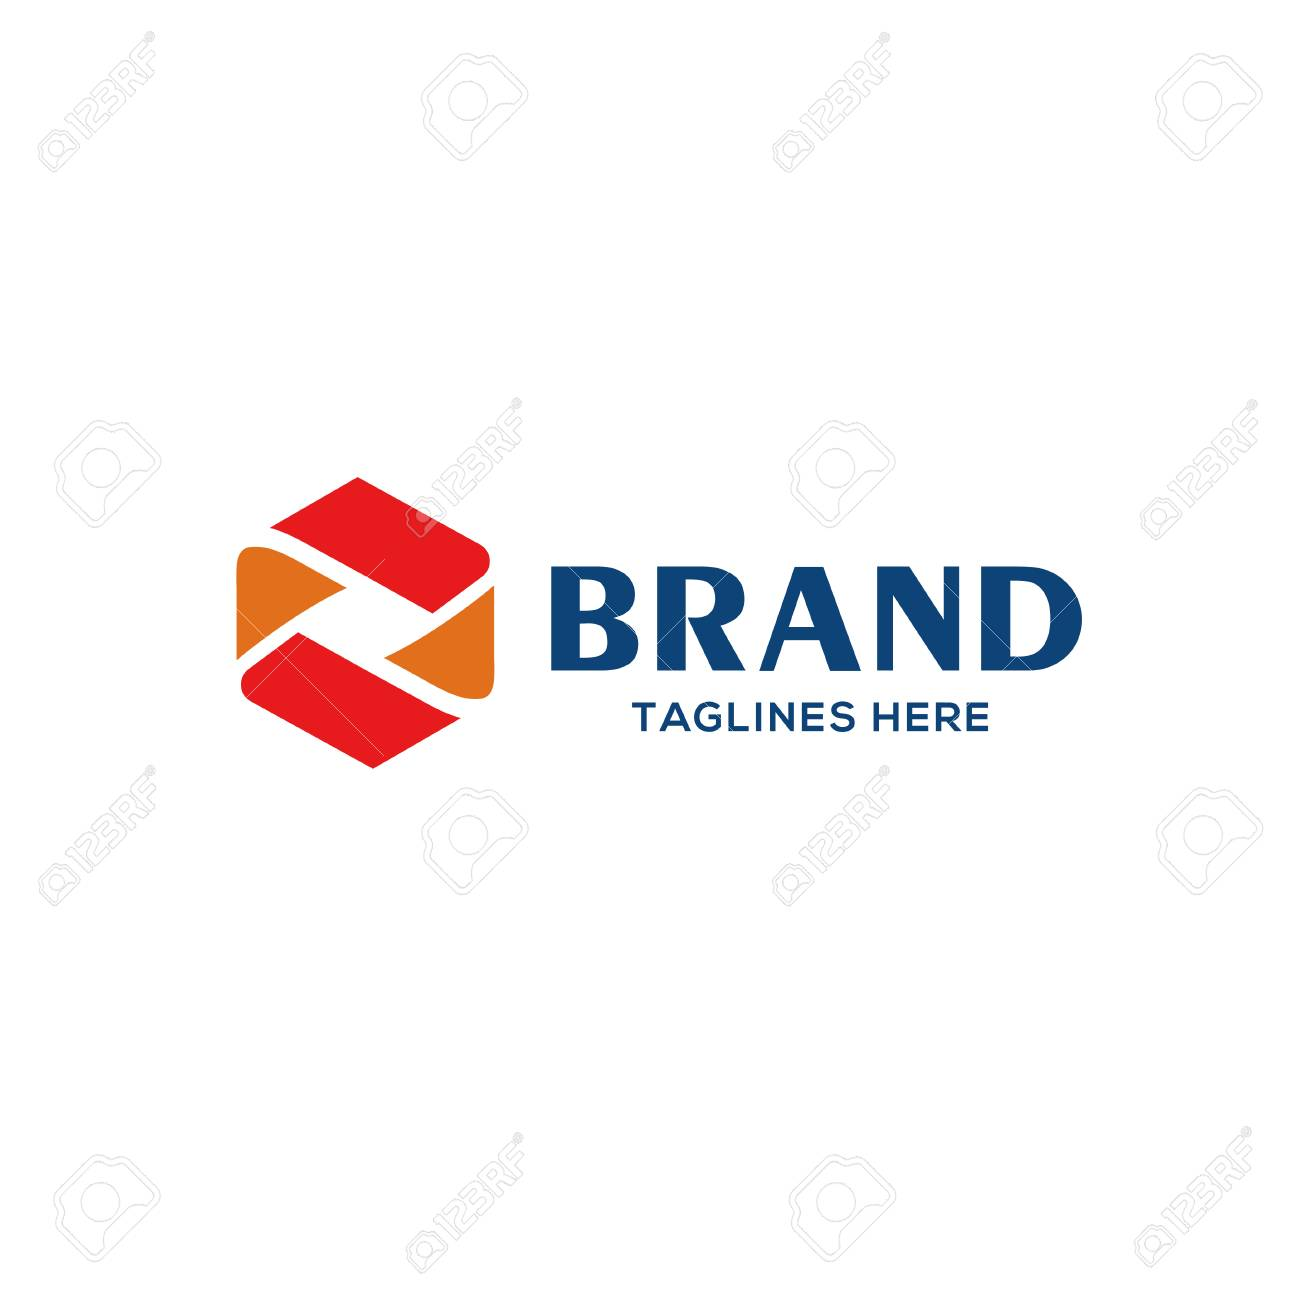 abstract consulting logo,Abstract vector technology logo icon